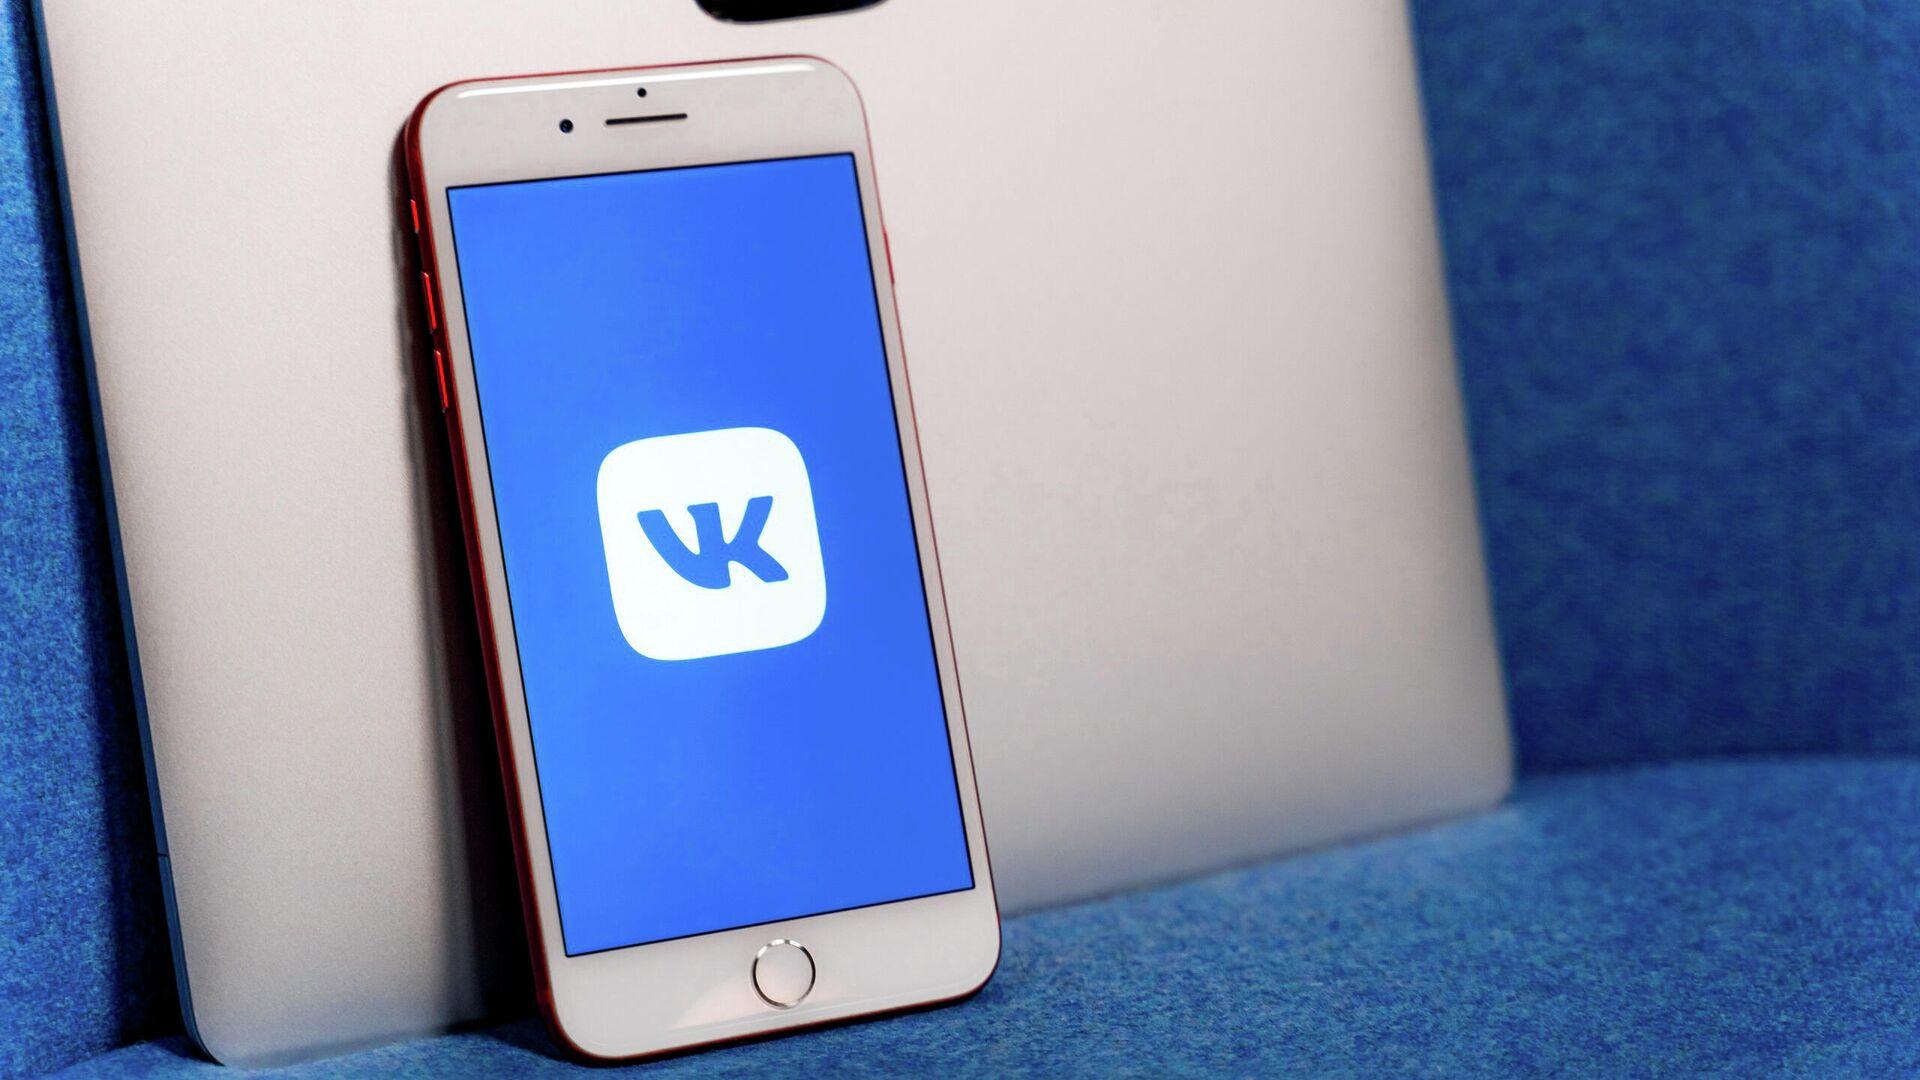 Логотип ВКонтакте на экране смартфона - РИА Новости, 1920, 14.09.2020